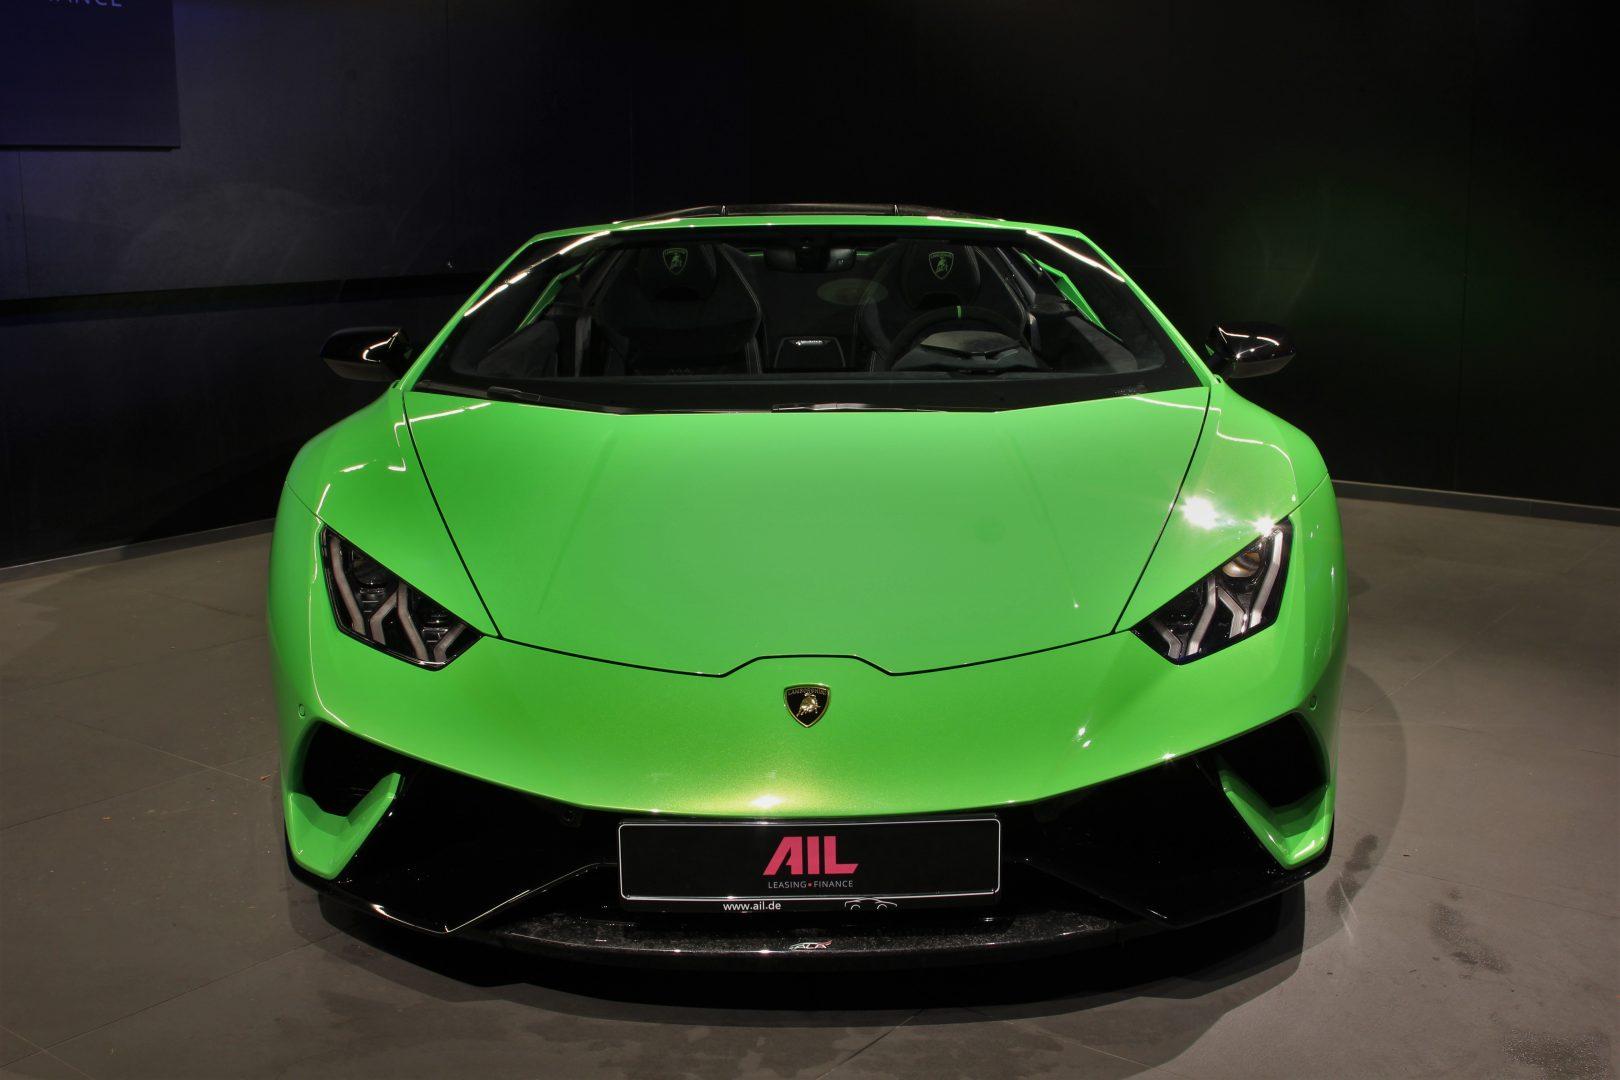 AIL Lamborghini Huracan Performante Spyder LP 640-4 Verda Mantis 13